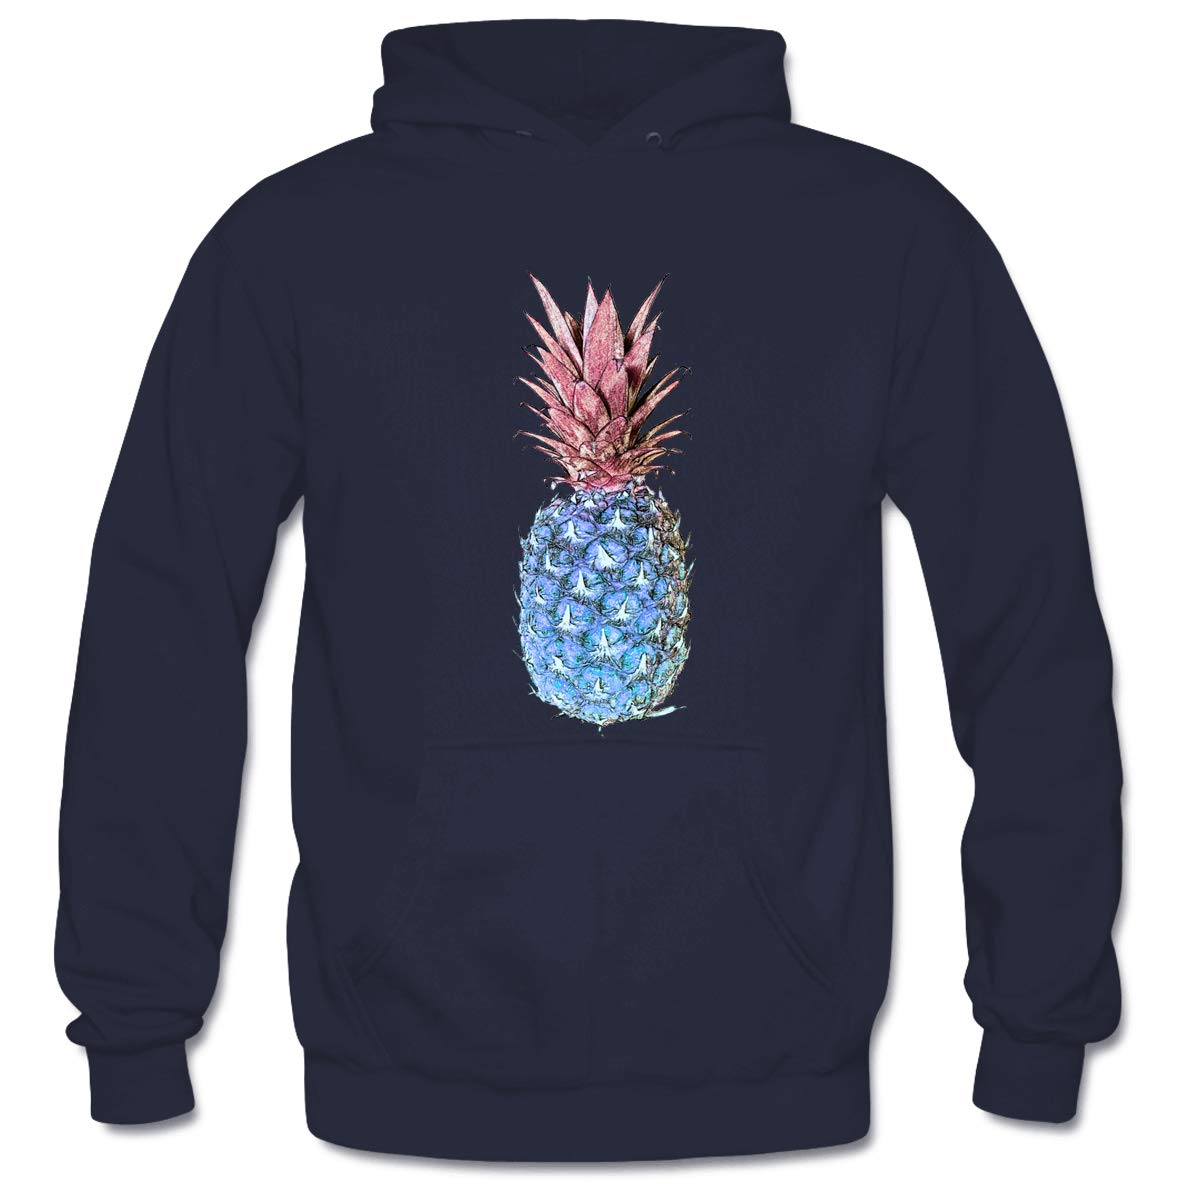 Mens Artistic Pineapples #1 Hooded Sweatshirt Funny Printed Pullover Hoodies Classic Long Sleeve T Shirt Tops